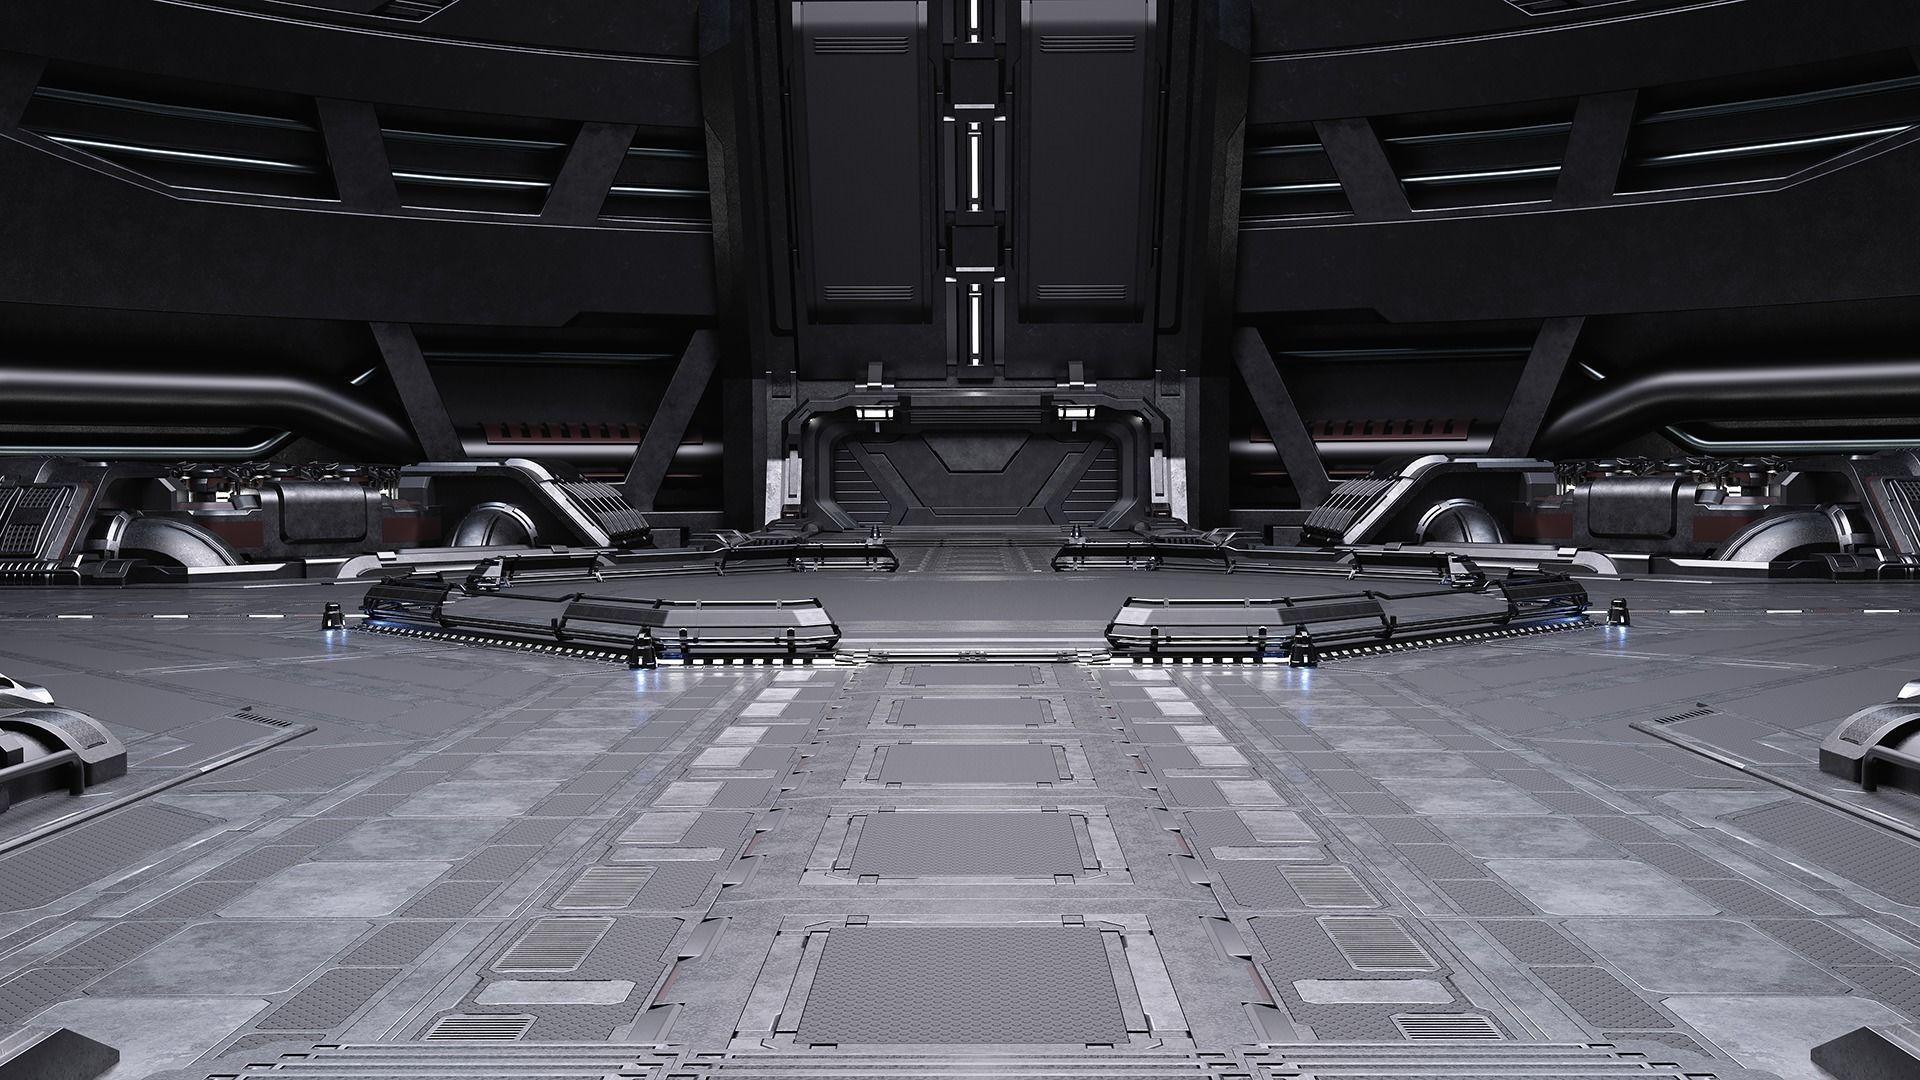 Sci-fi Scene for renders Time Travel